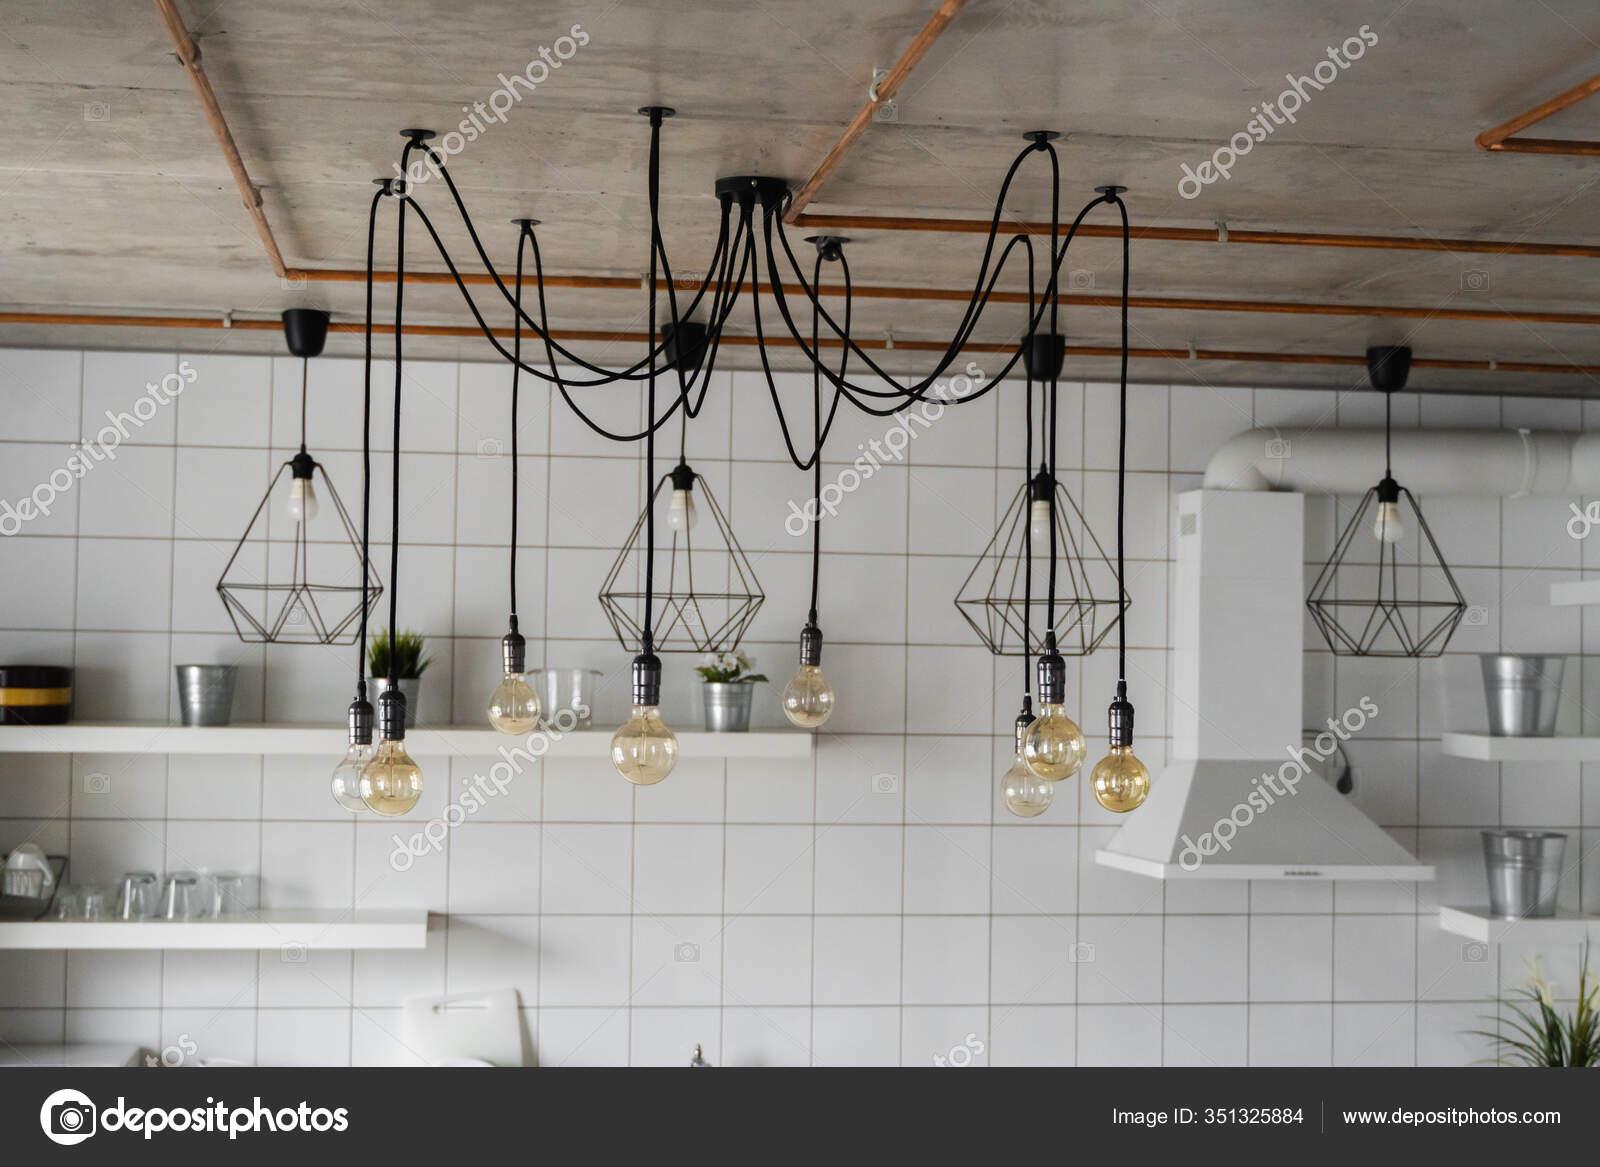 Lighting On A Modern Kitchen In Comfortable Apartment Vintage Luxury Interior Lighting Lamp As A Home Decor Stock Photo C Volodymyrshtun 351325884